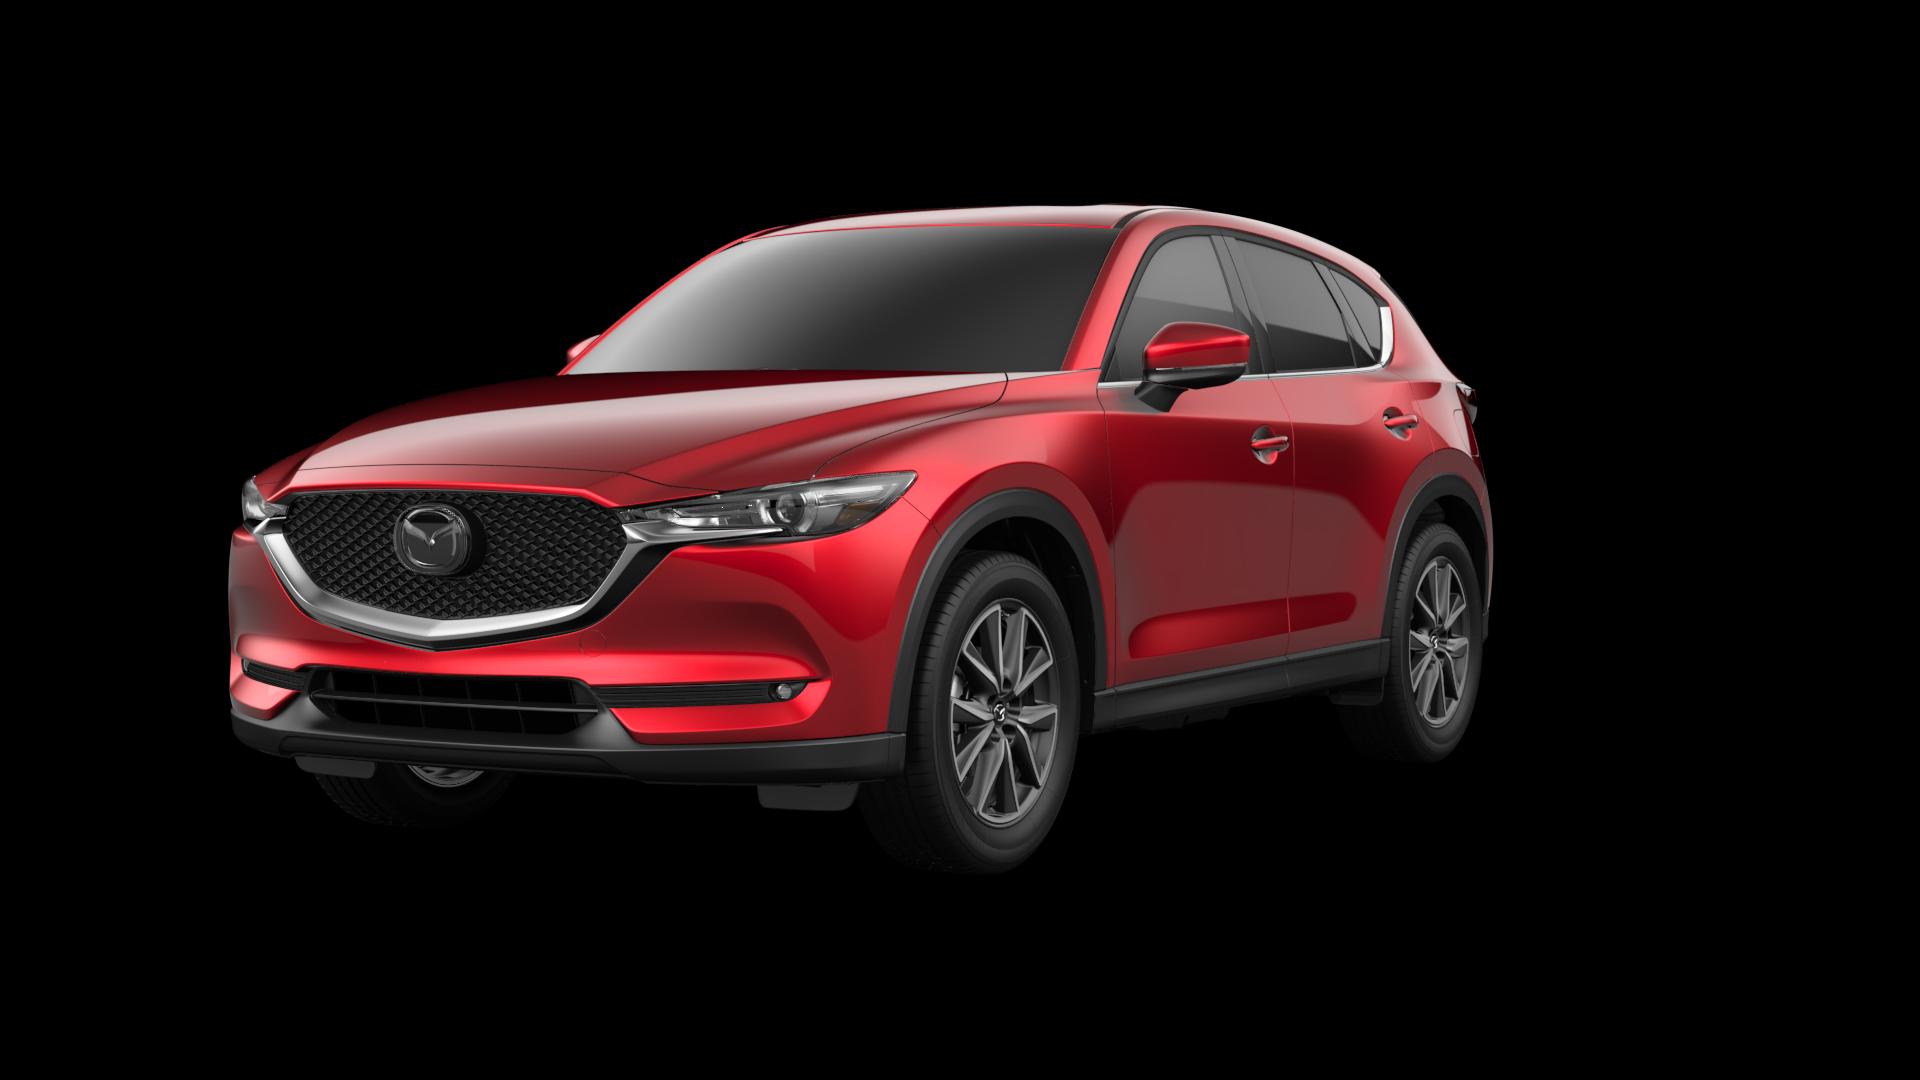 2017 CX-5 Soul Red